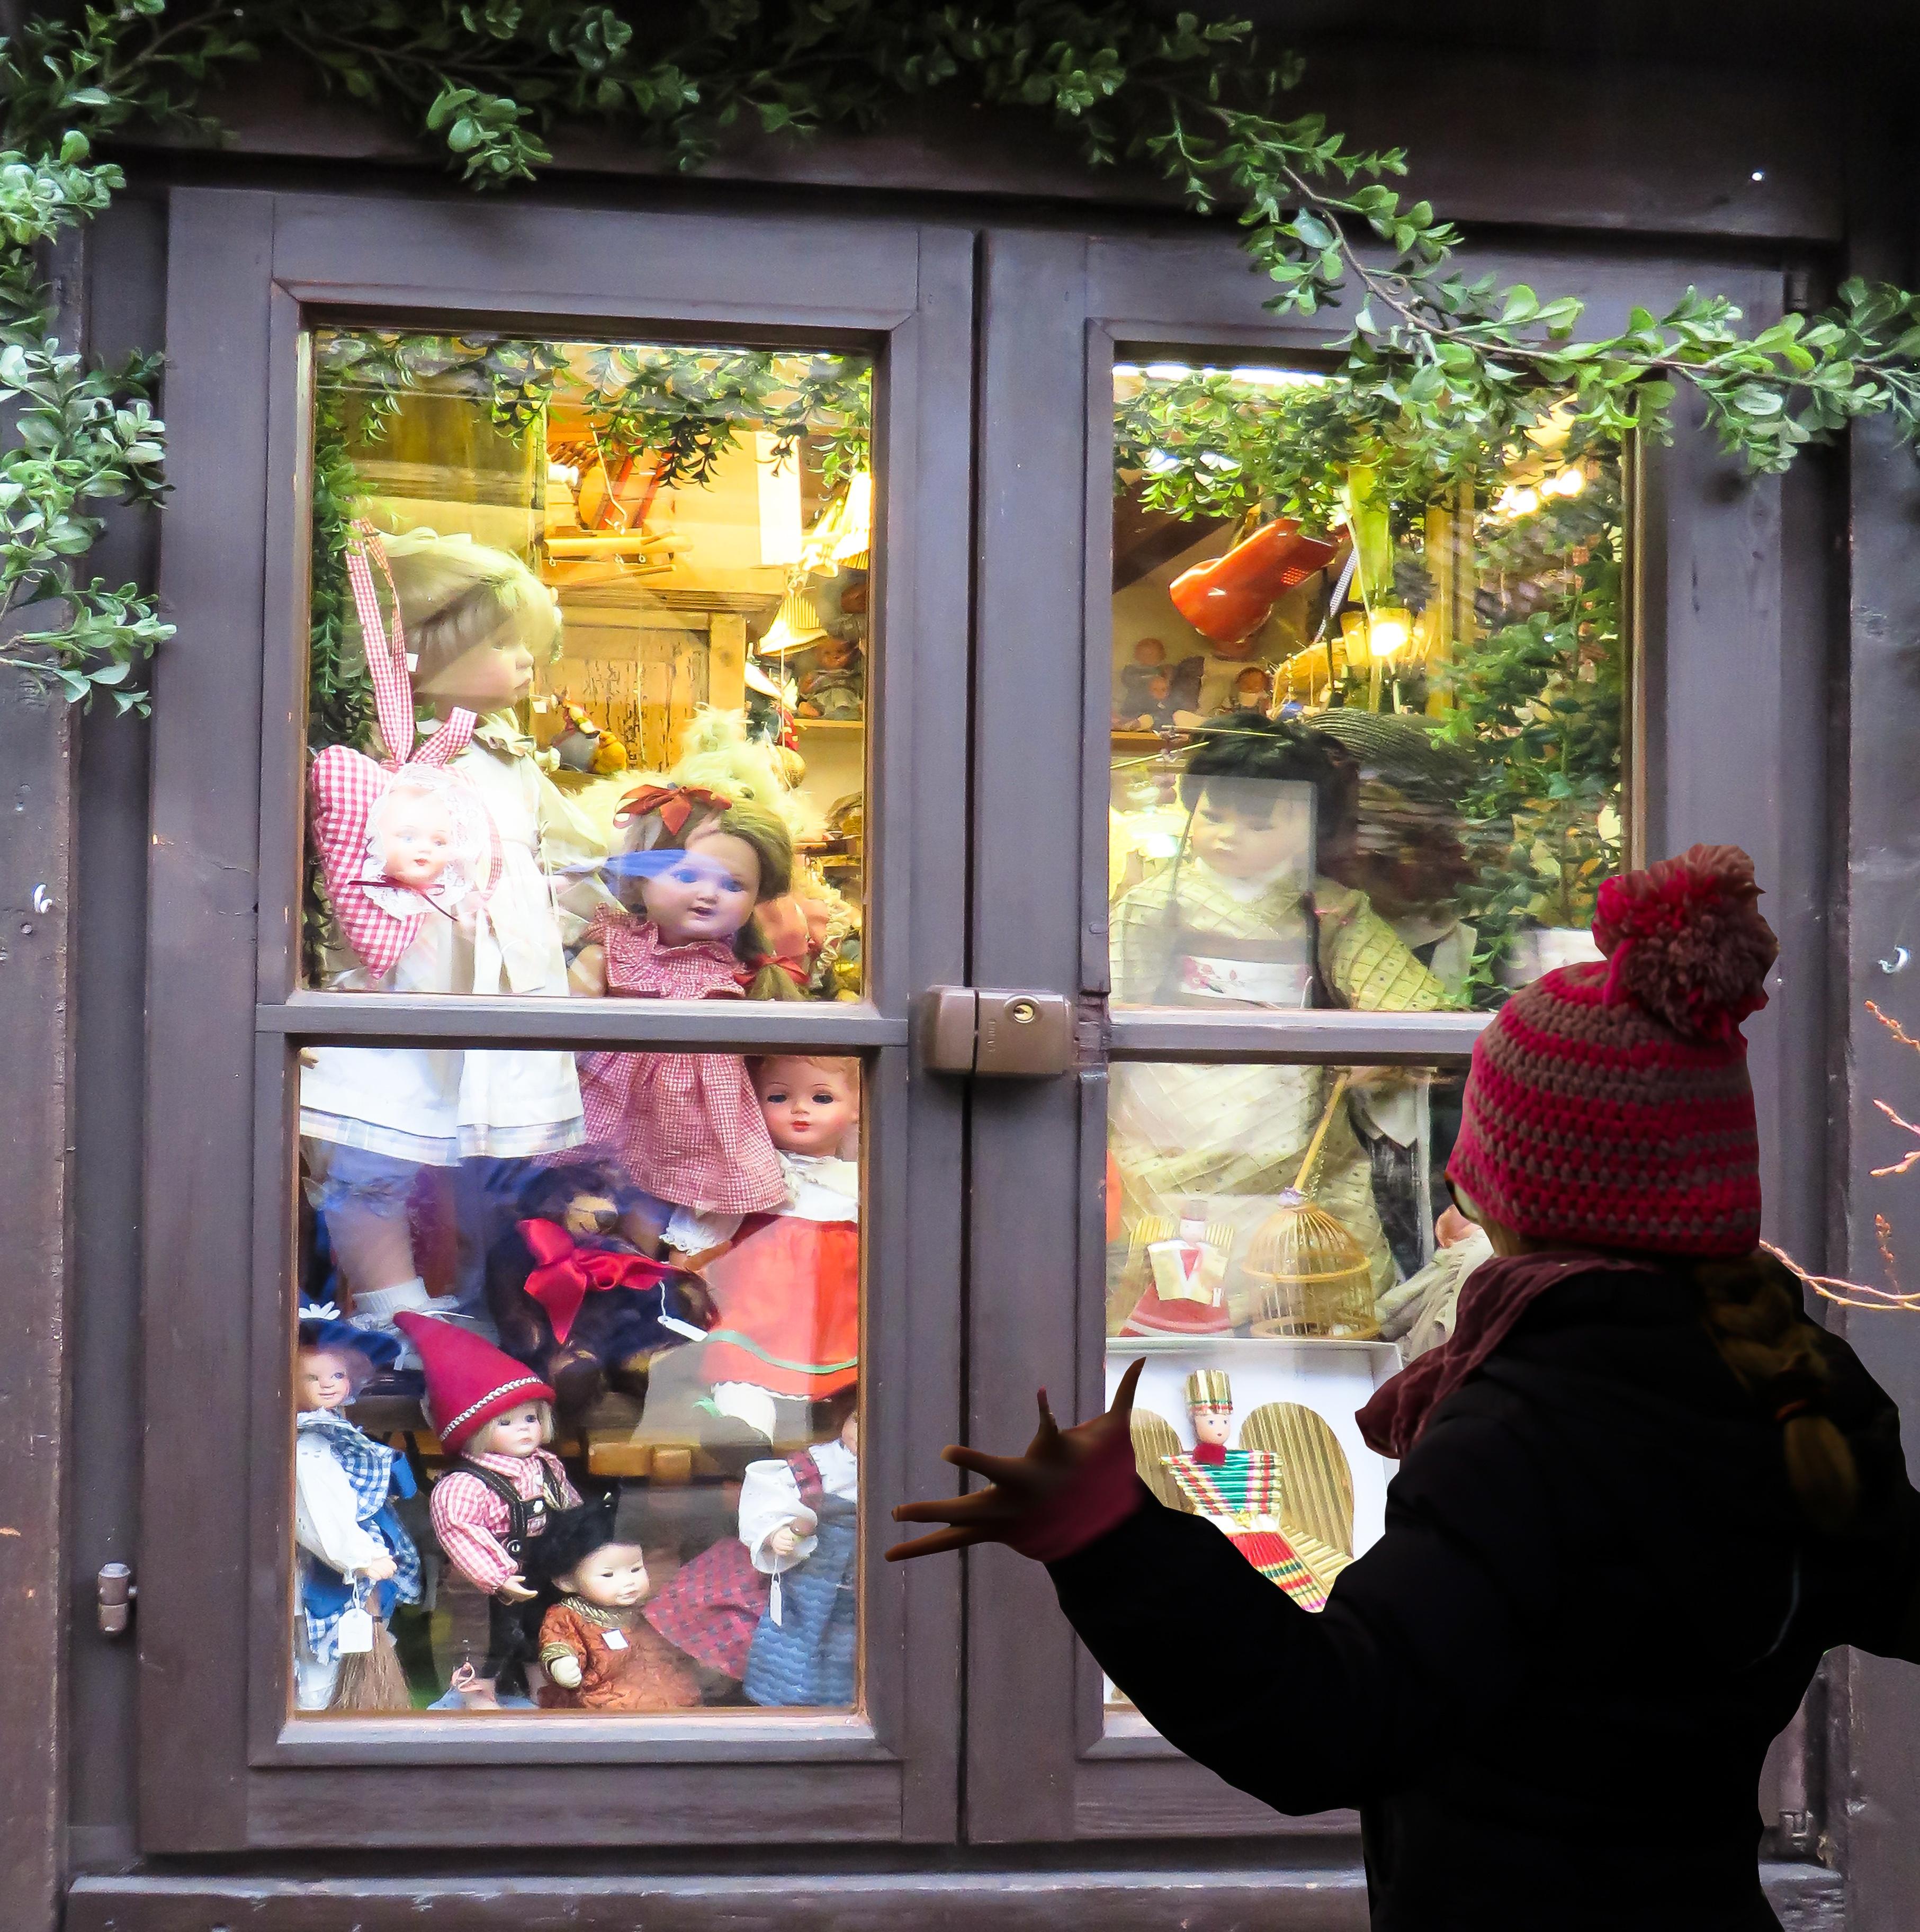 Fotos gratis : niña, flor, color, niño, compras, muñeca, art ...